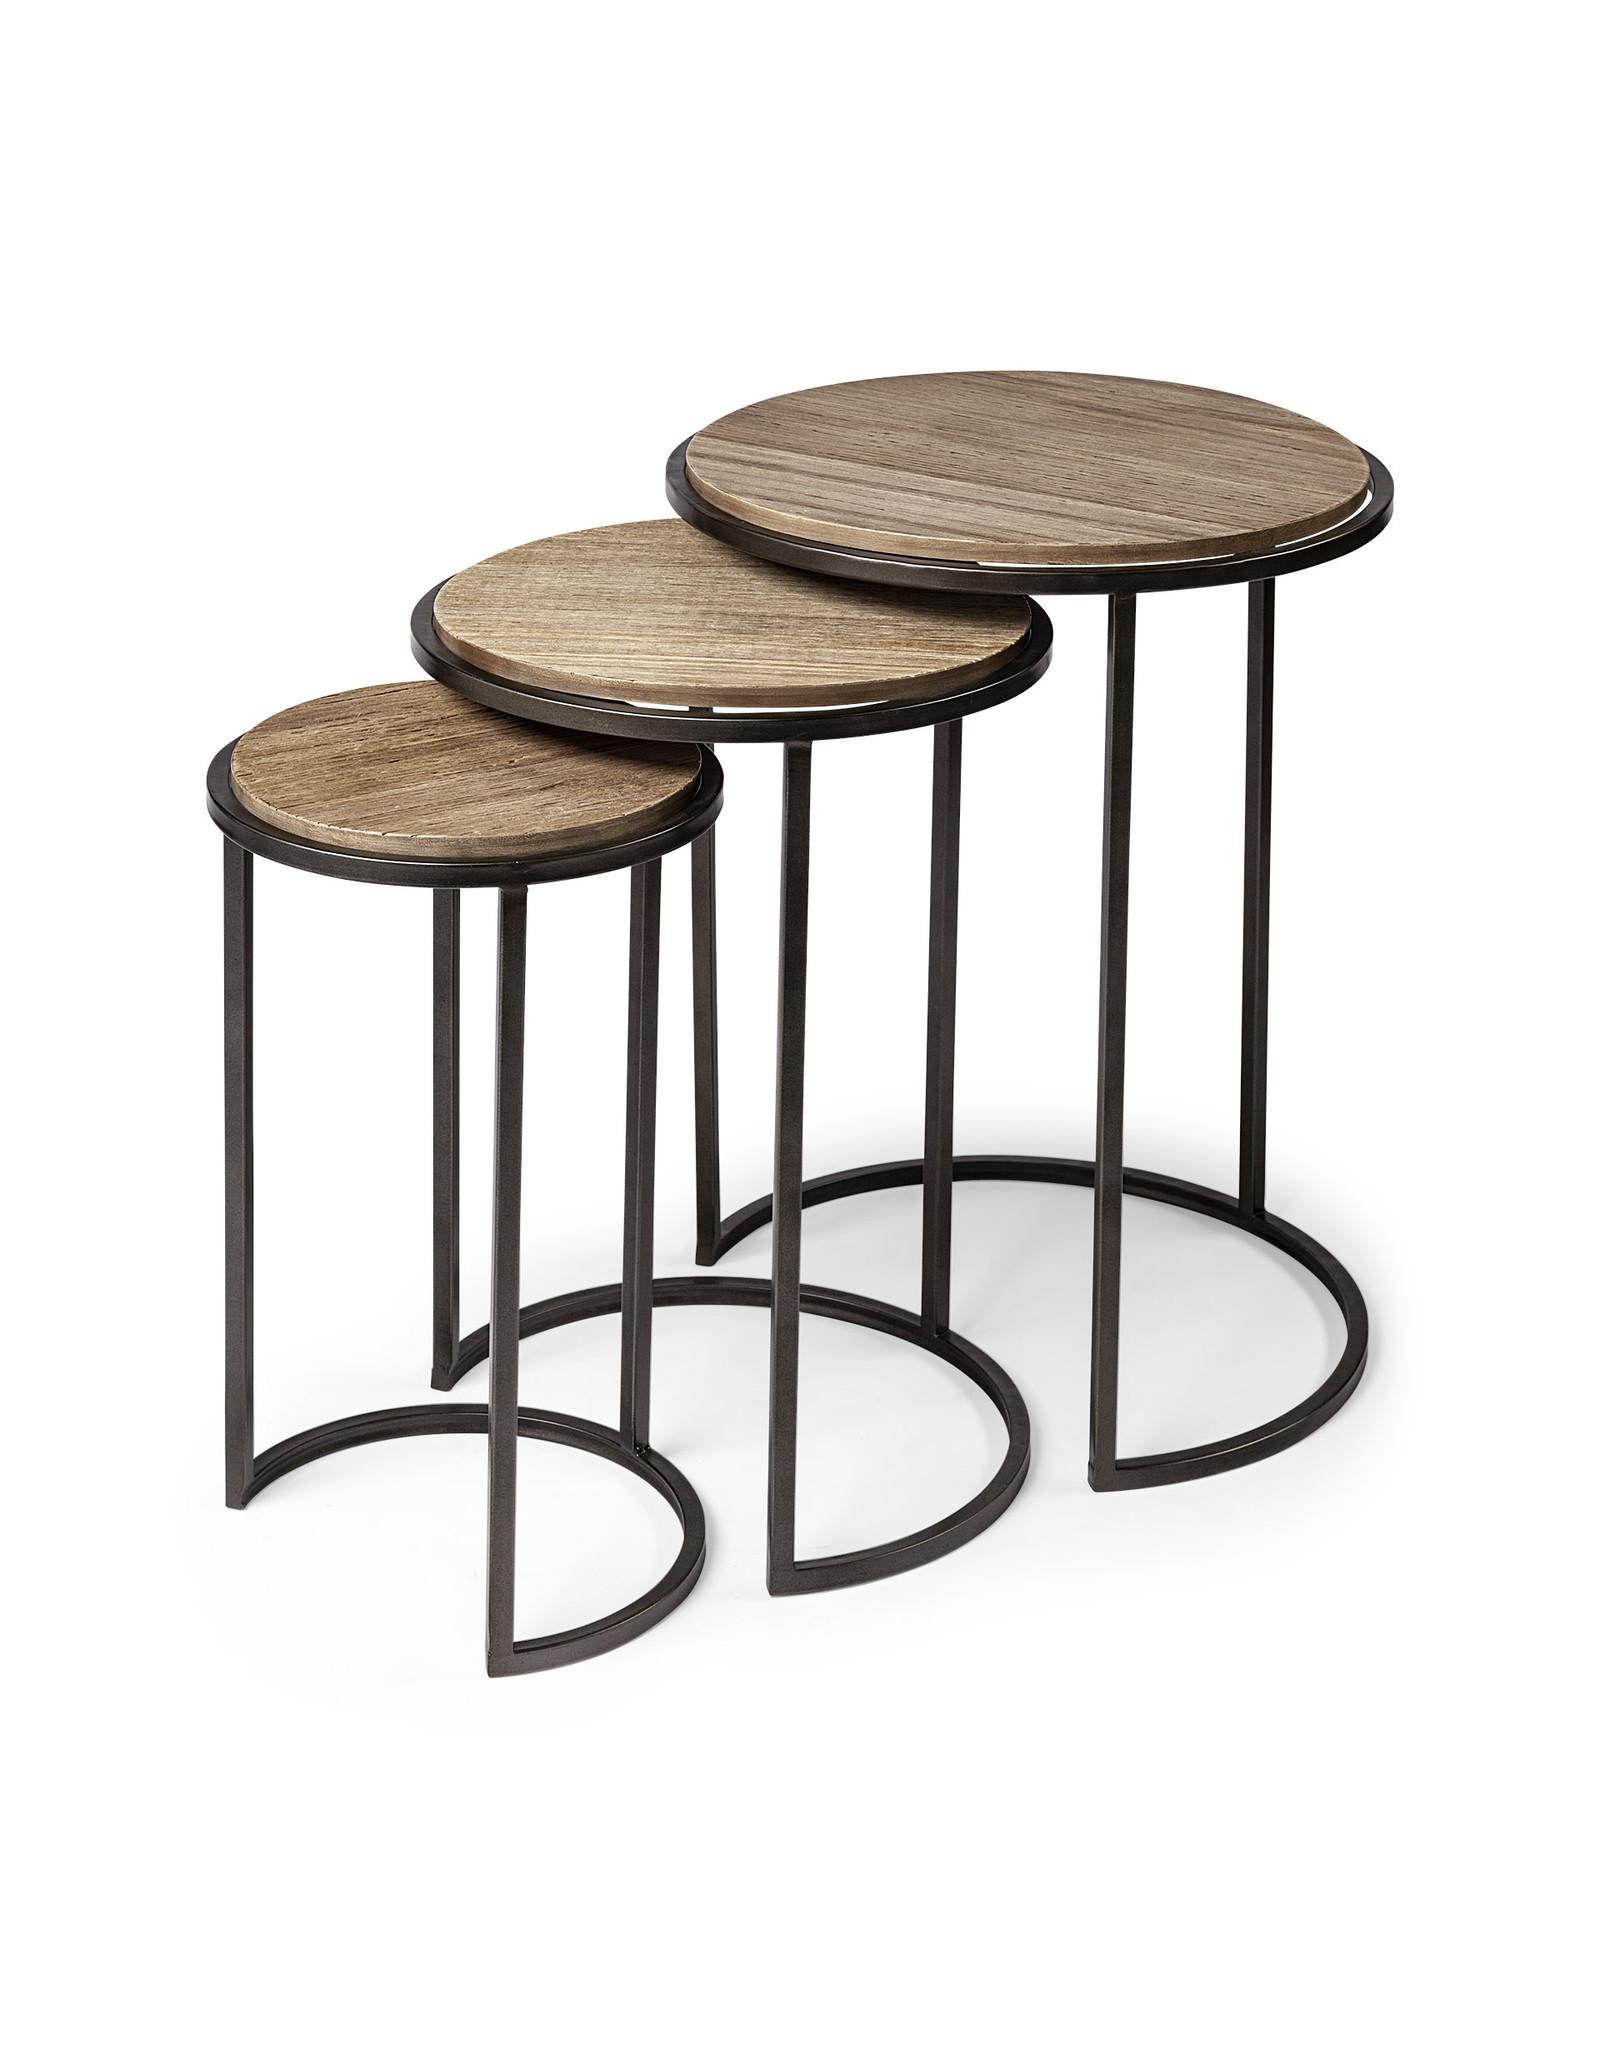 Tables d'appoint brunes